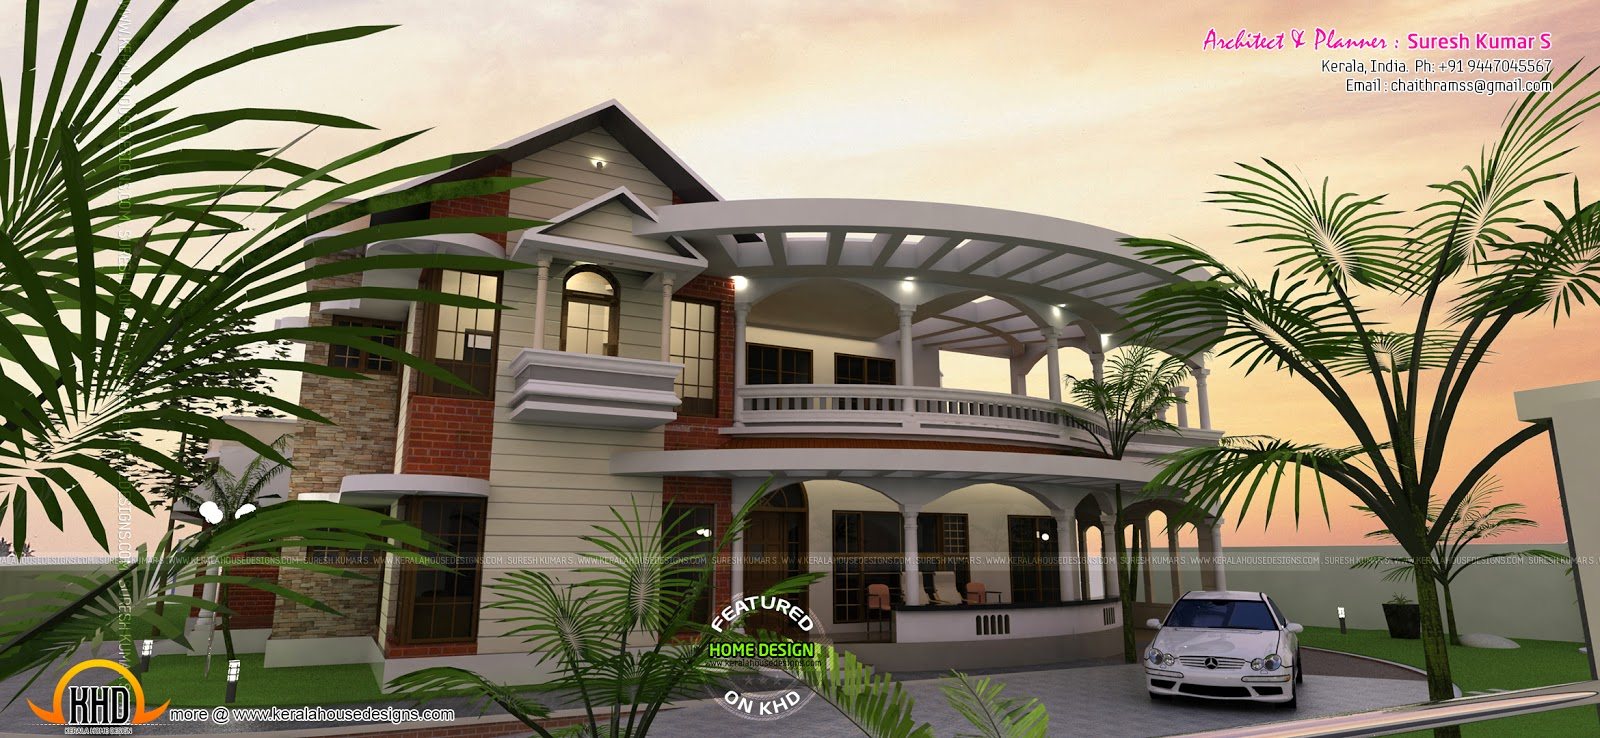 Great Home Design - minimalist home design